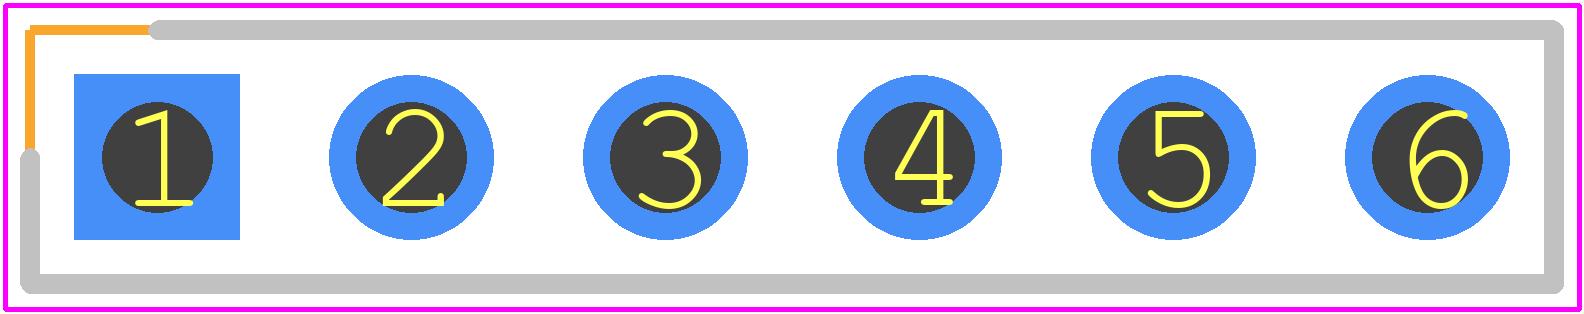 90120-0766 - Molex PCB footprint - Header, Vertical - My 1x6 Single Row Straight Pin Header